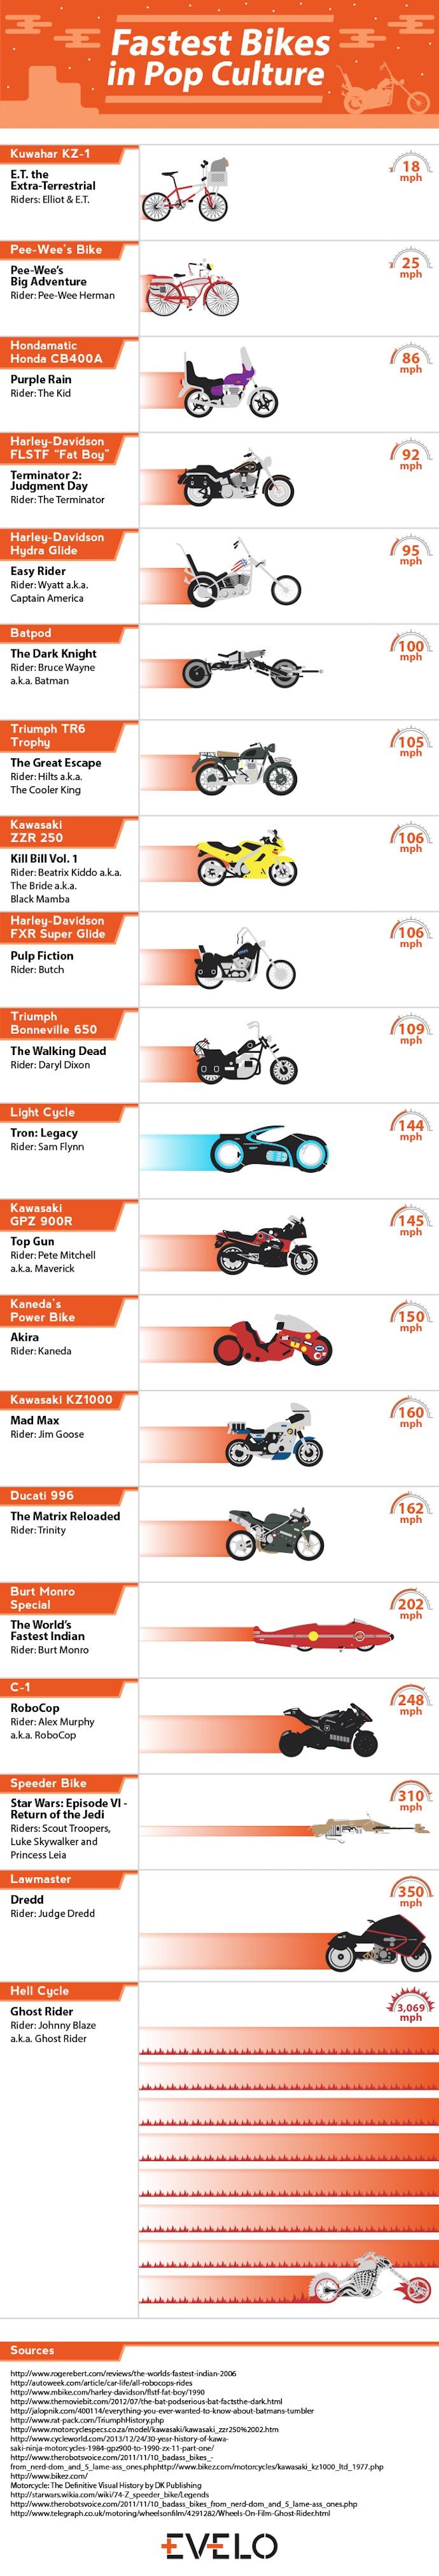 fastest fiction bikes